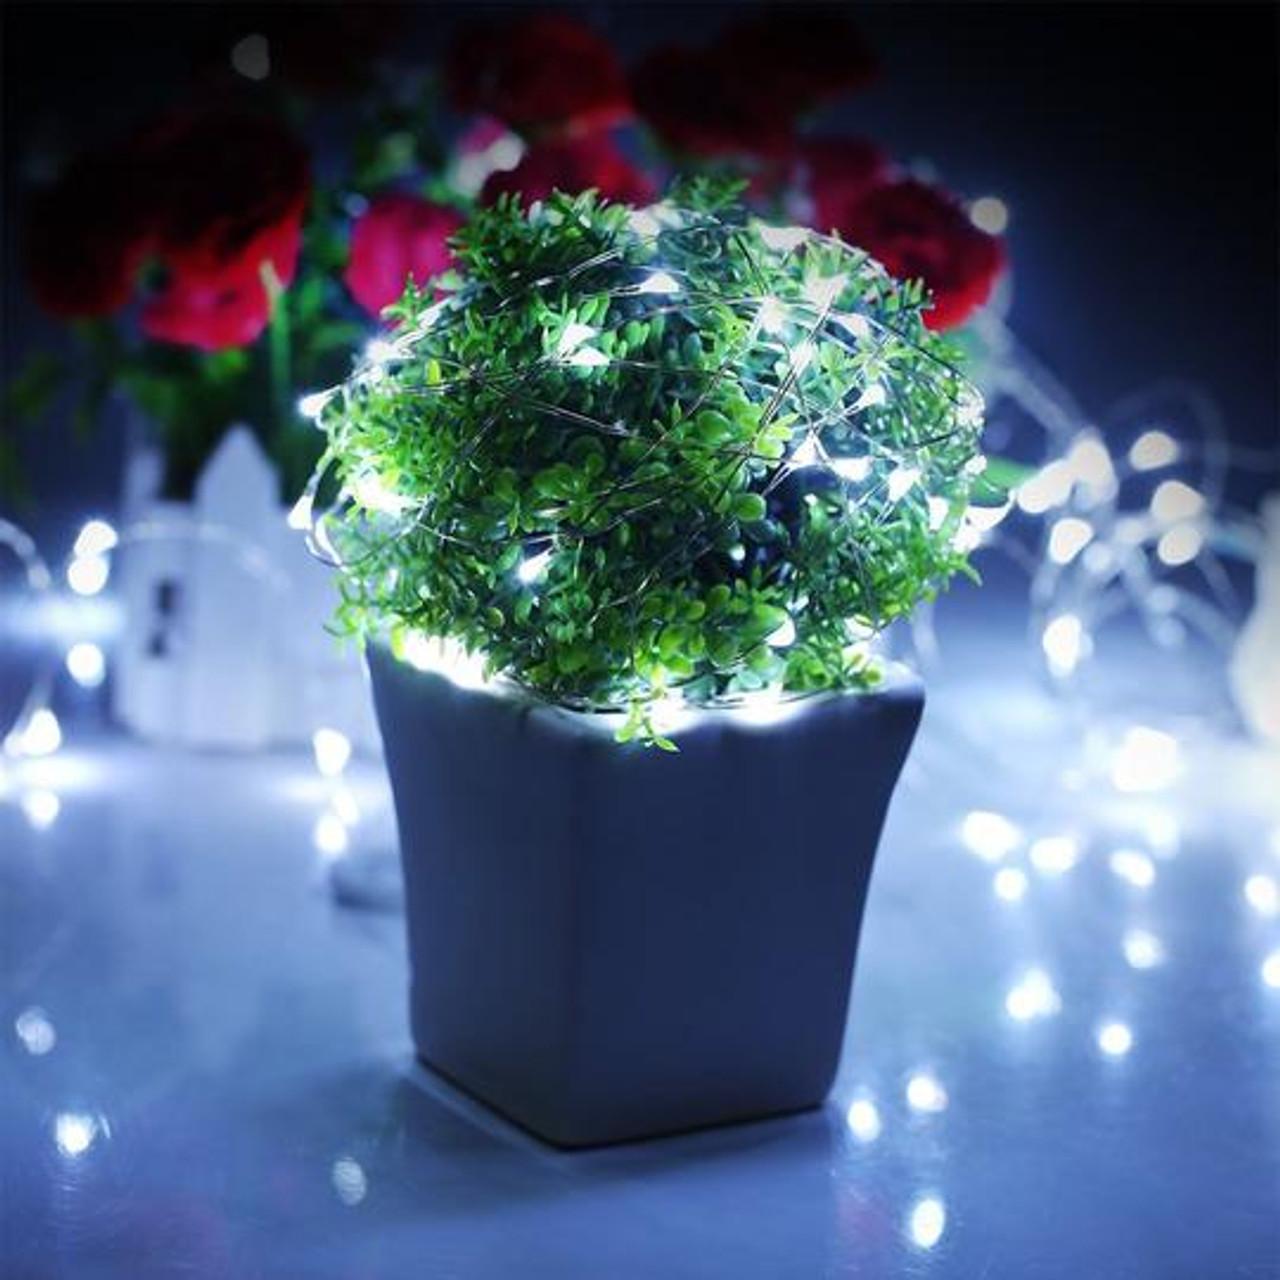 LED, RGB, RF, Remote Control, Fairy light, wireless, low voltage, waterproof, decorations, decor, home, wedding, planters, garden